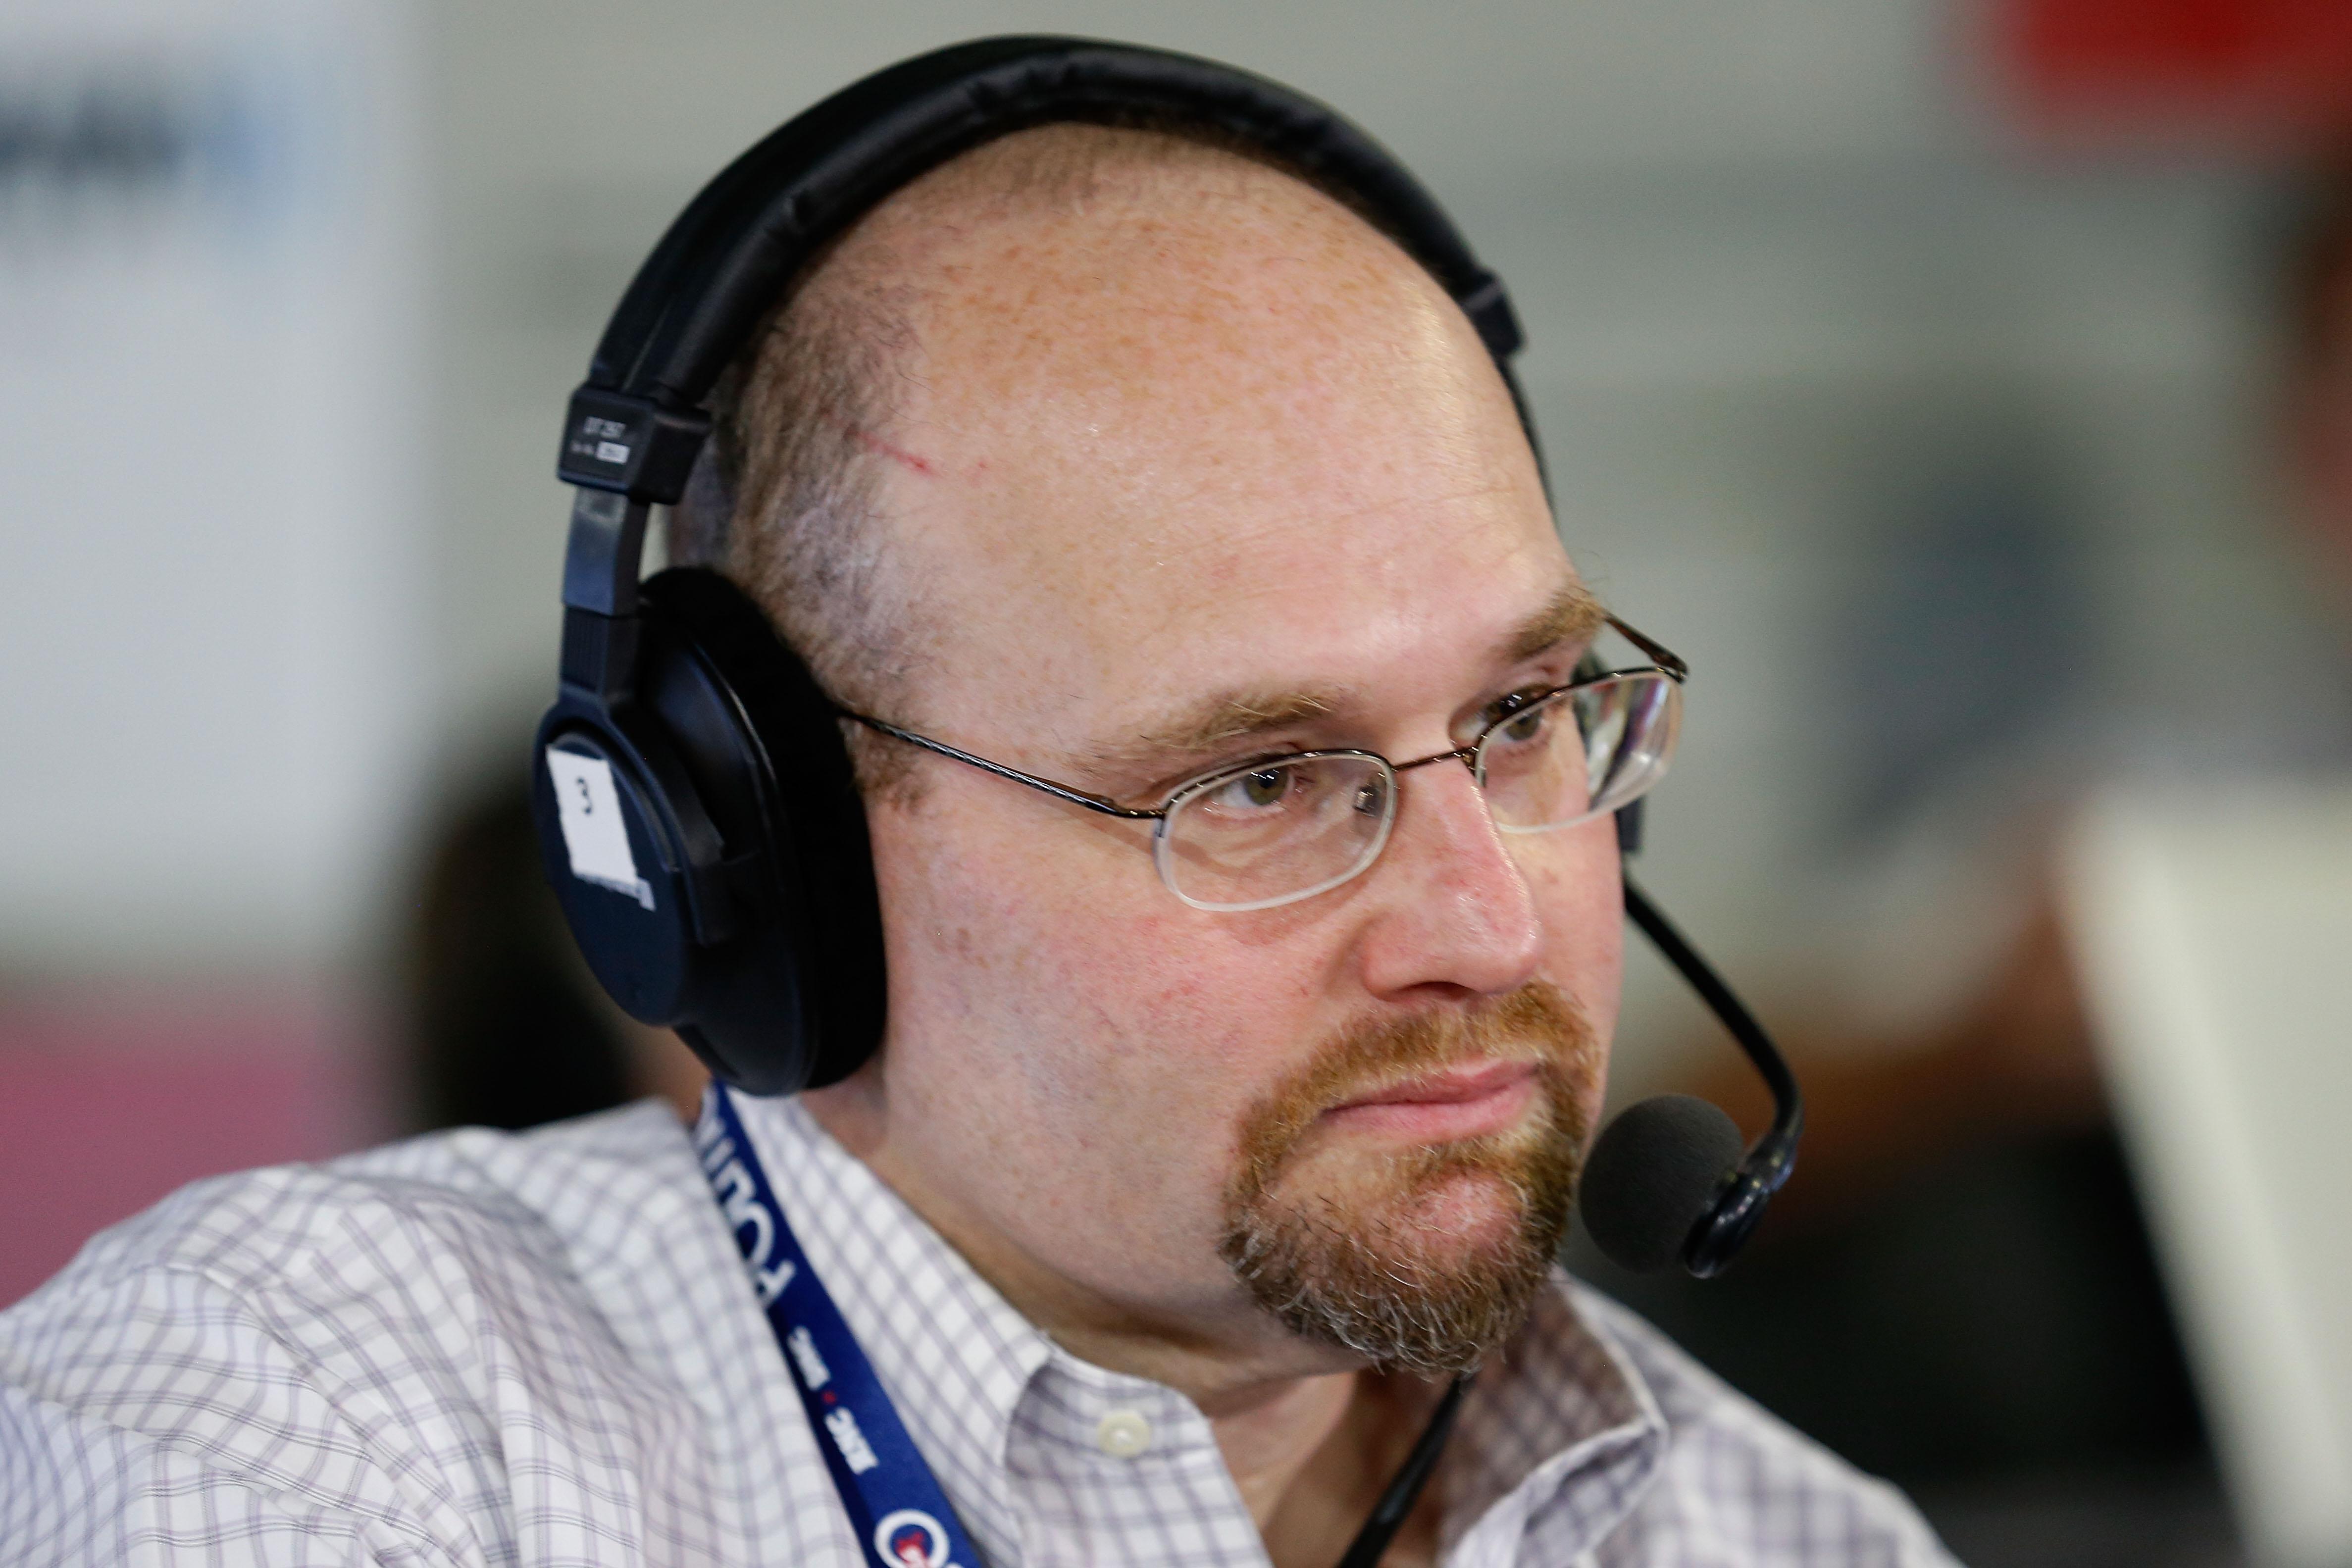 New York Times Reporter Glenn Thrush Has Been Suspended Amid Harassment Allegations